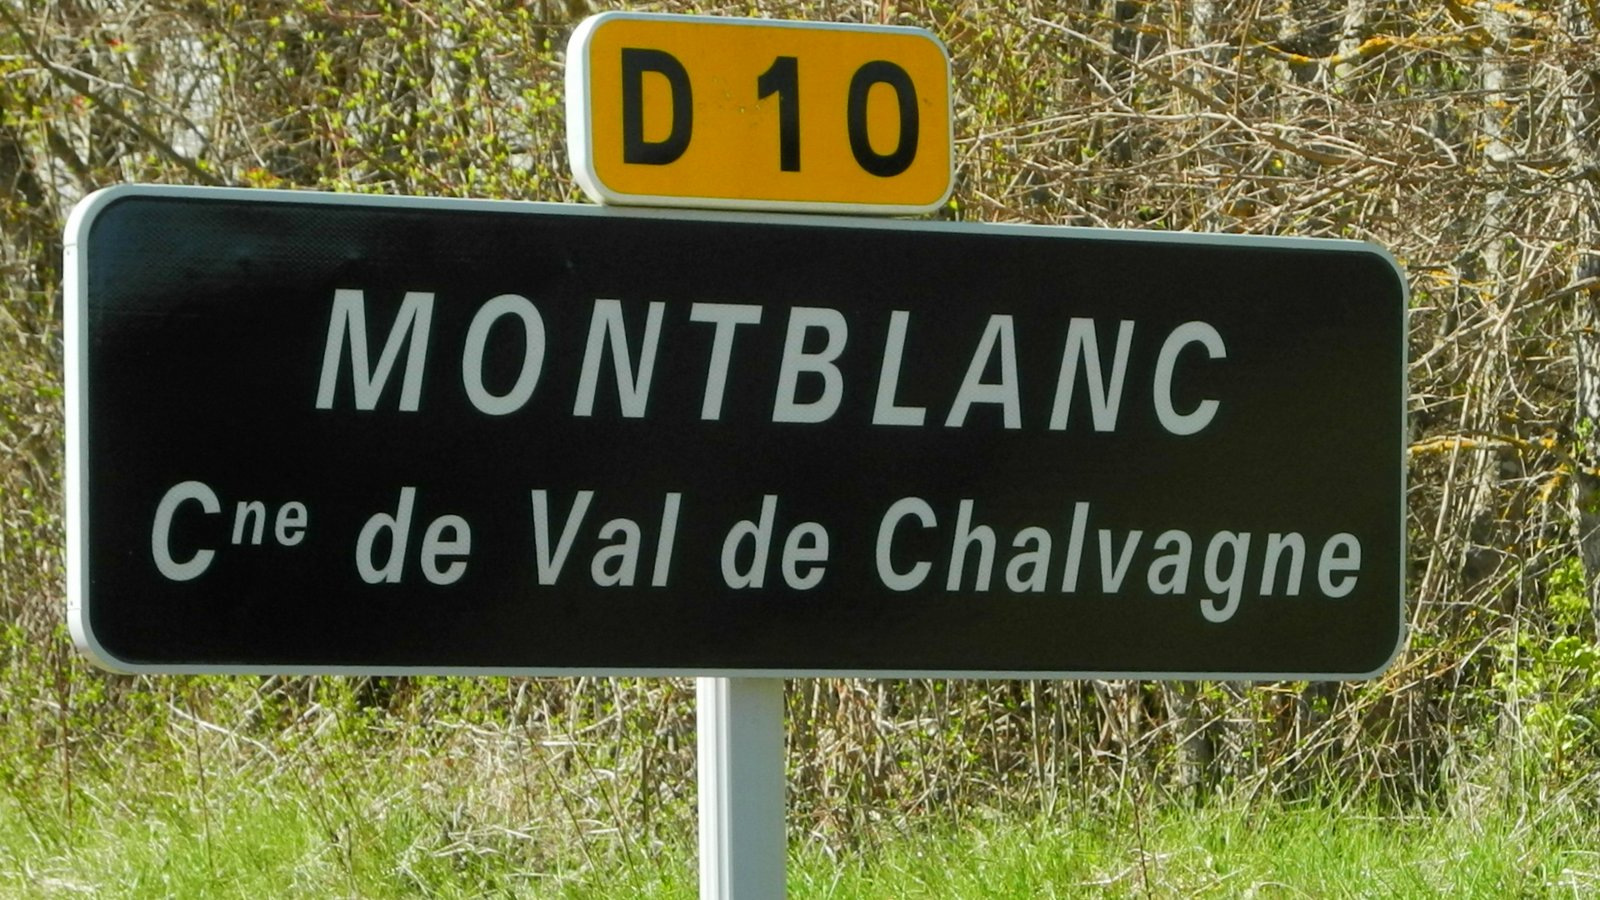 Montblanc ....